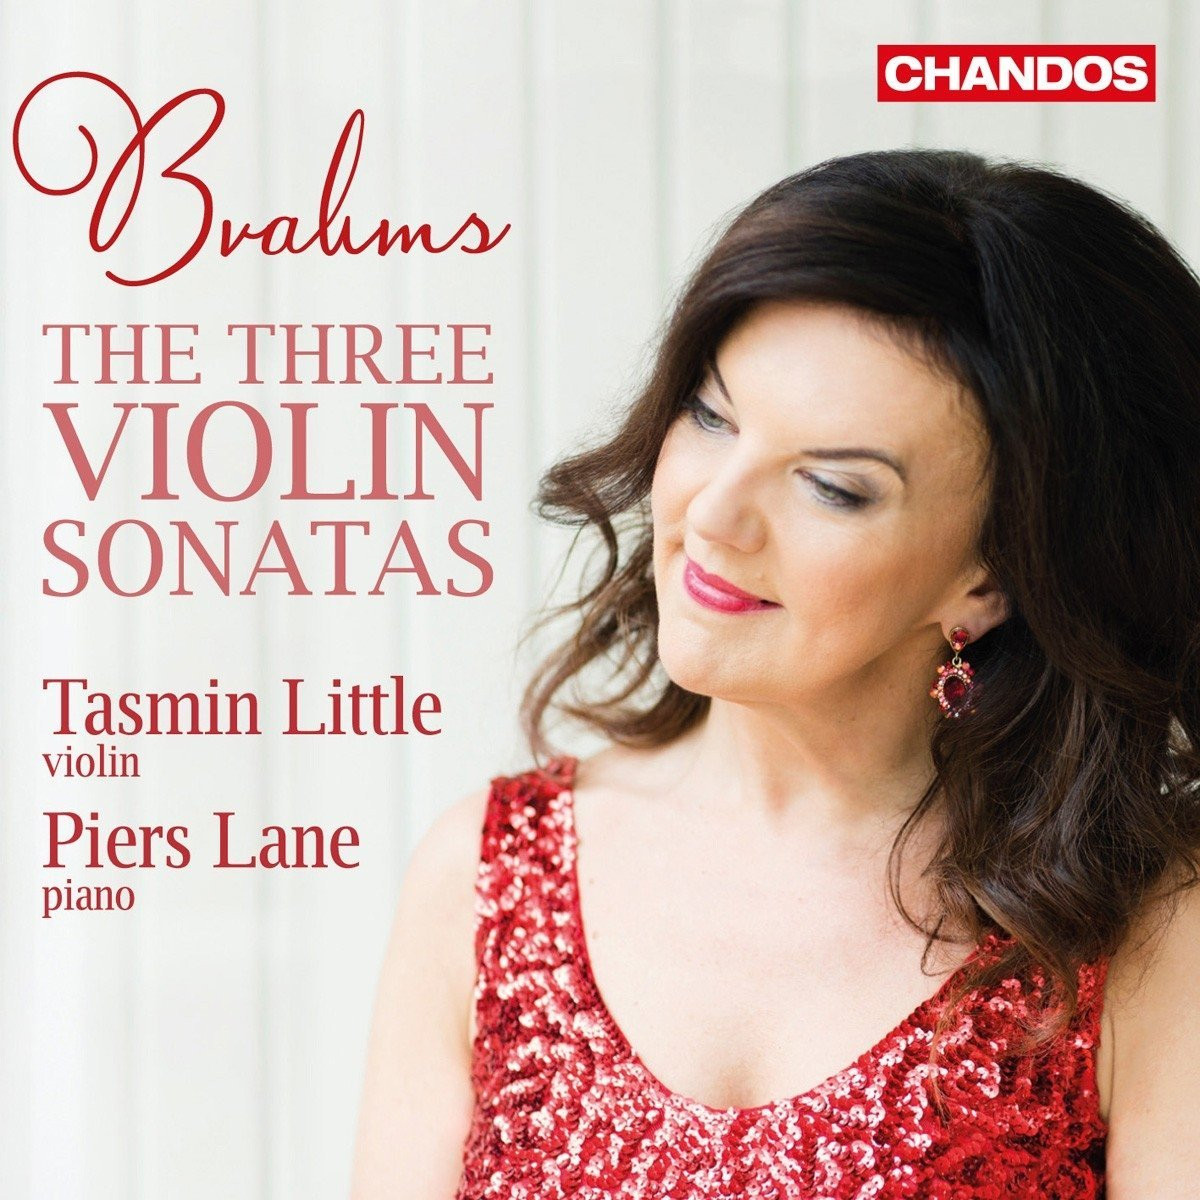 Brahms: Violin Sonatas - Tasmin Little, Piers Lane